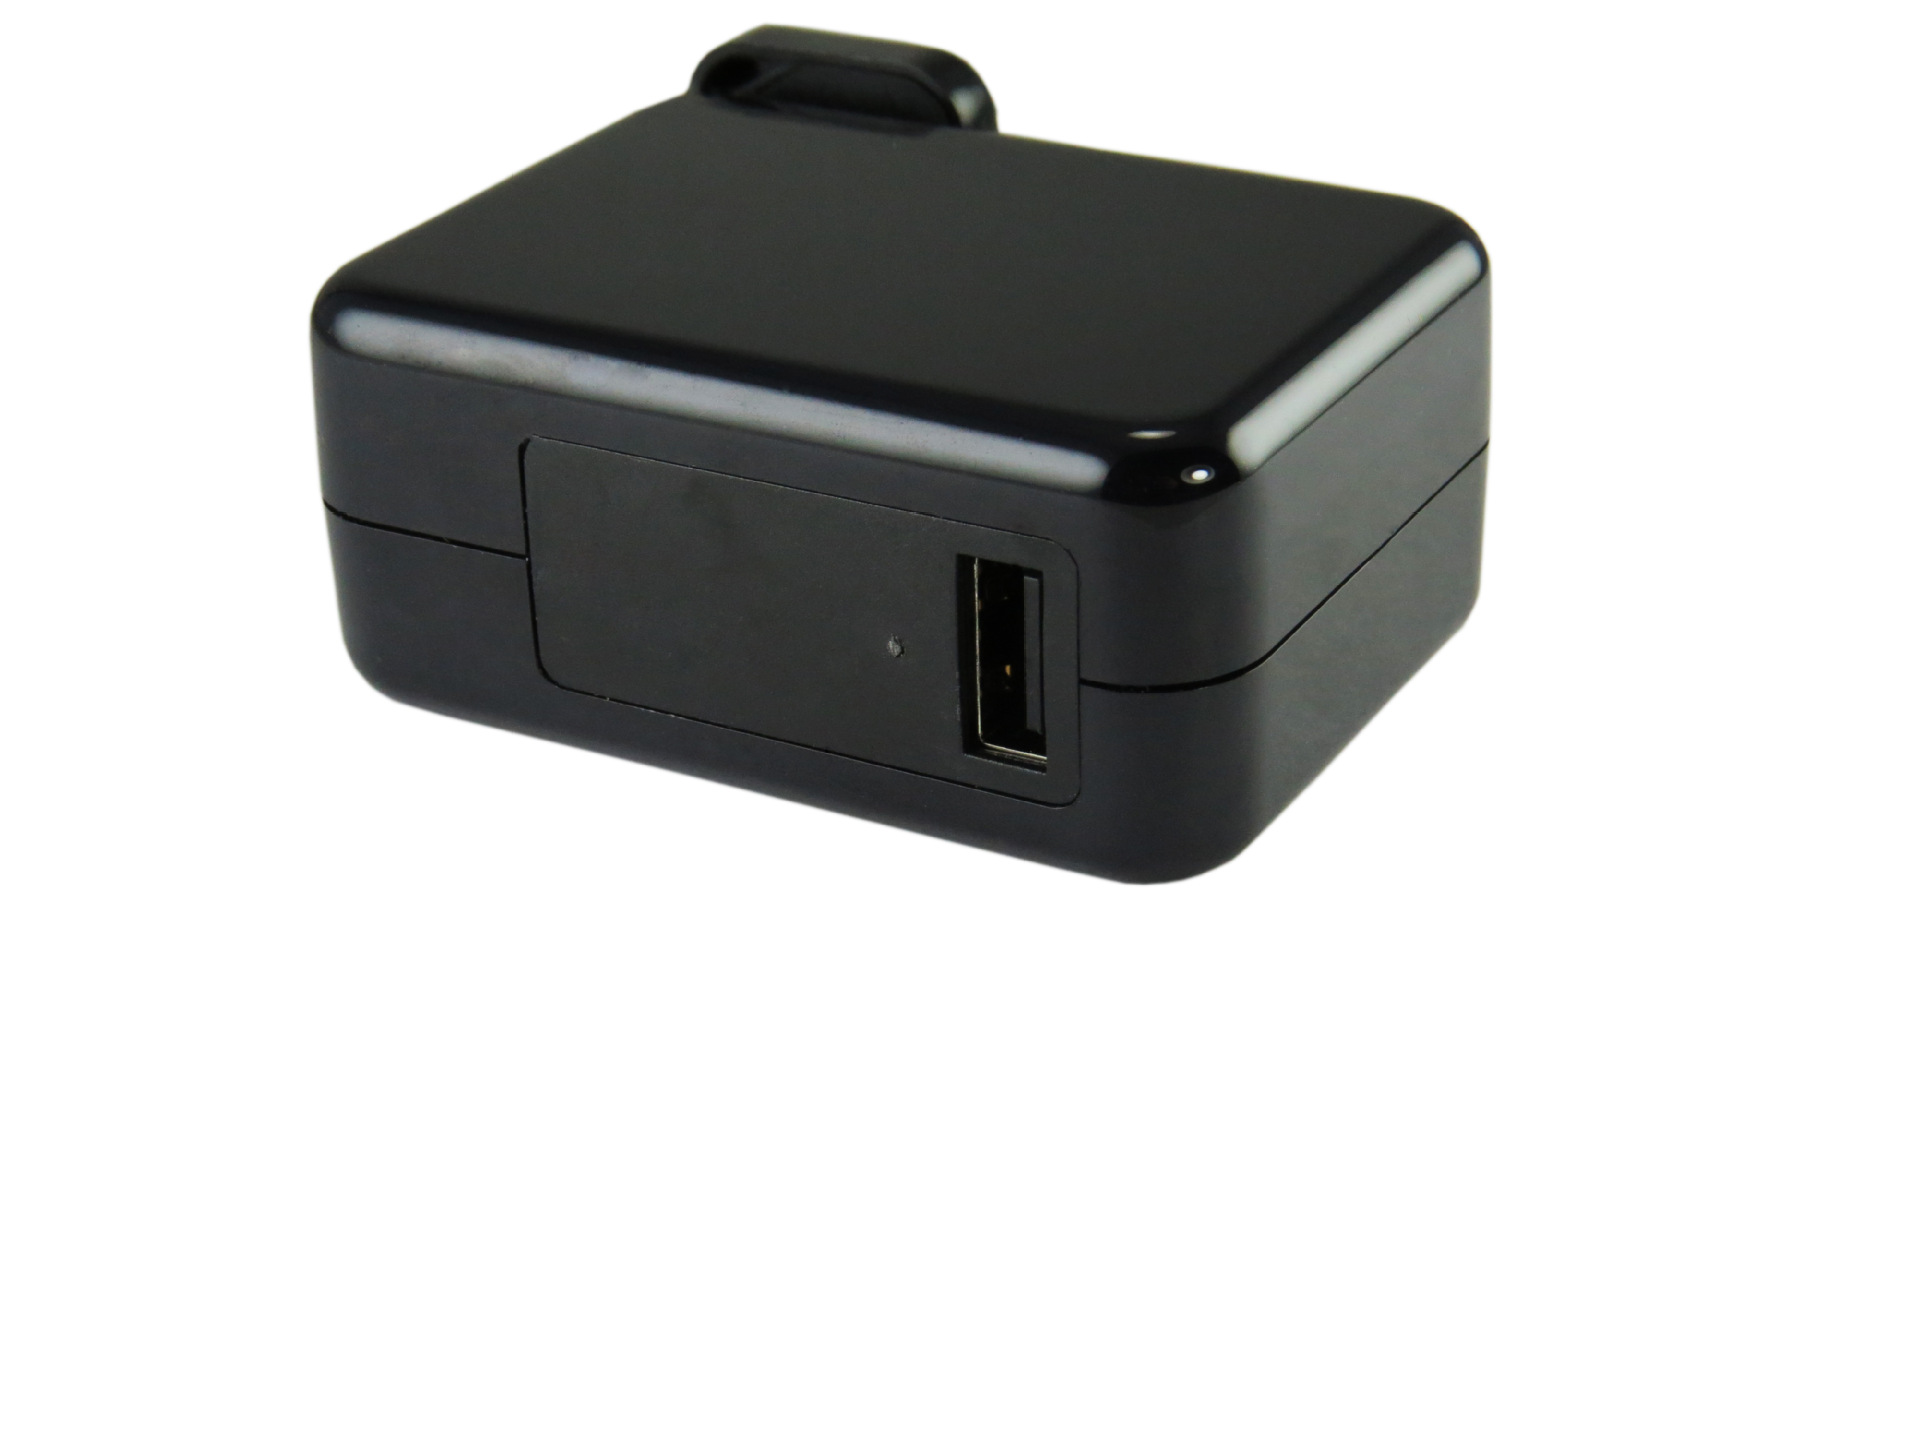 20V 2A 40W ноутбук қуат адаптері Lenovo Yoga3 Pro - Ноутбуктердің аксессуарлары - фото 4